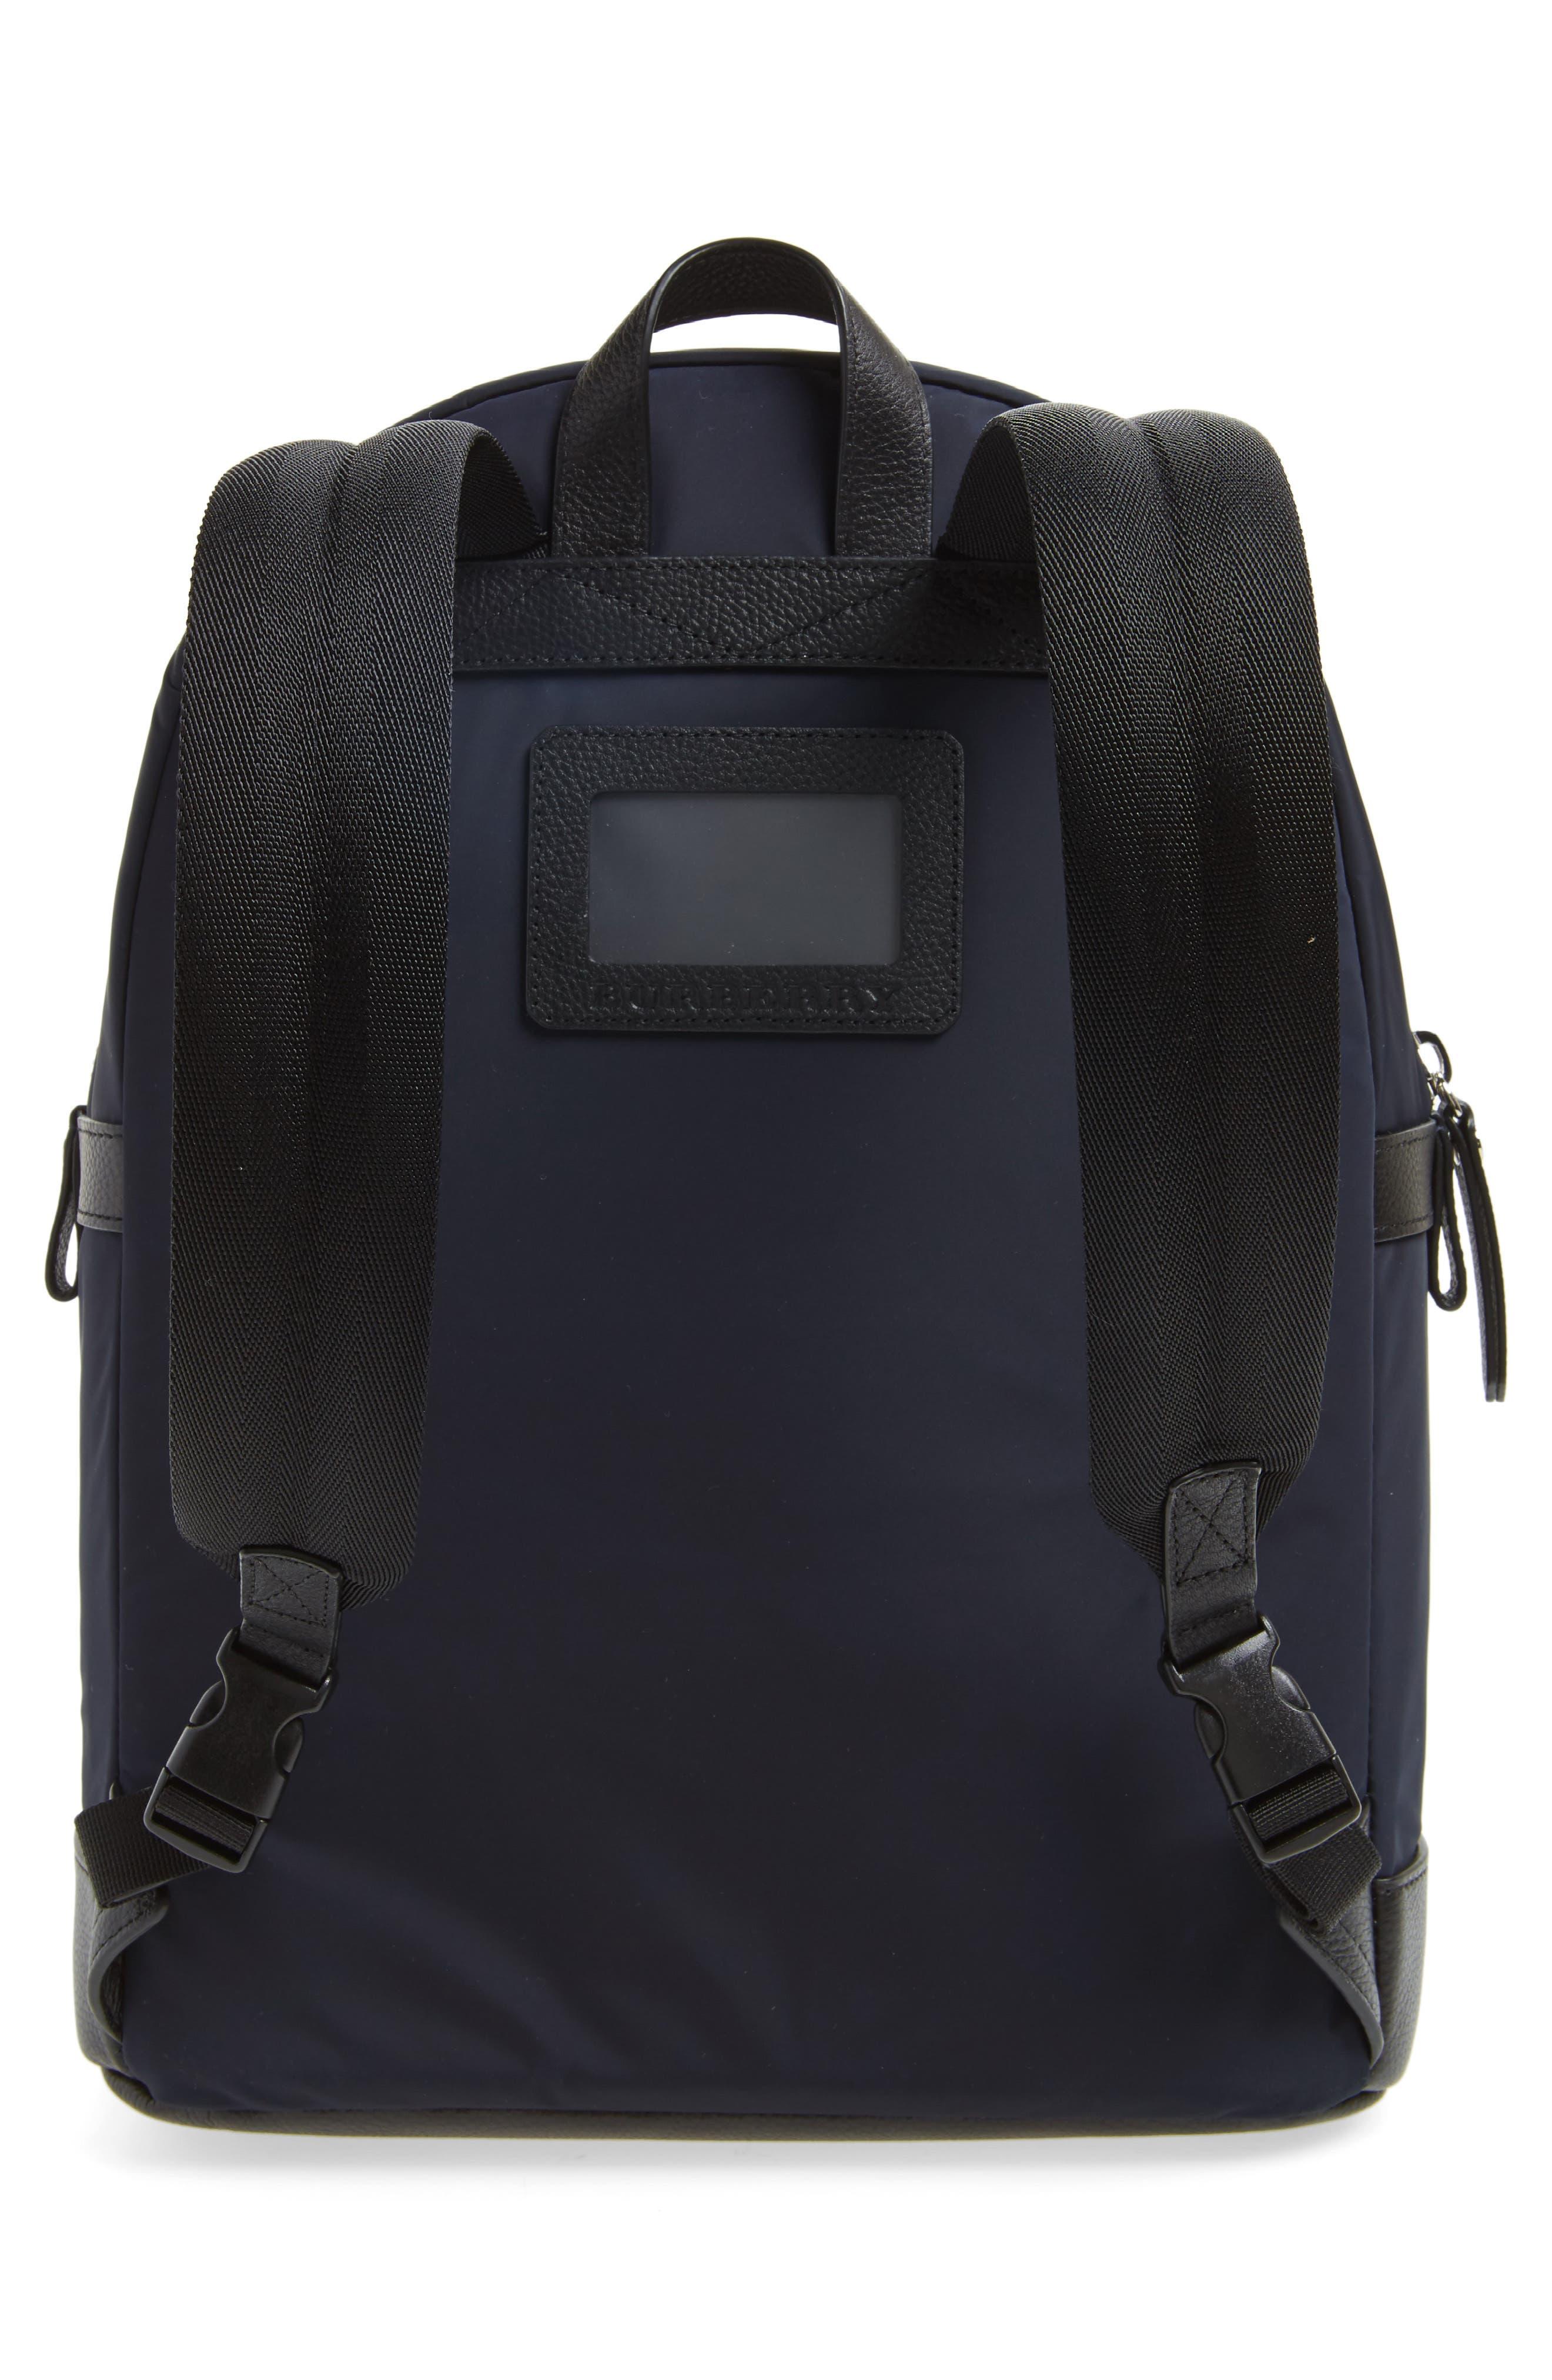 Nico London Backpack,                             Alternate thumbnail 2, color,                             Ink